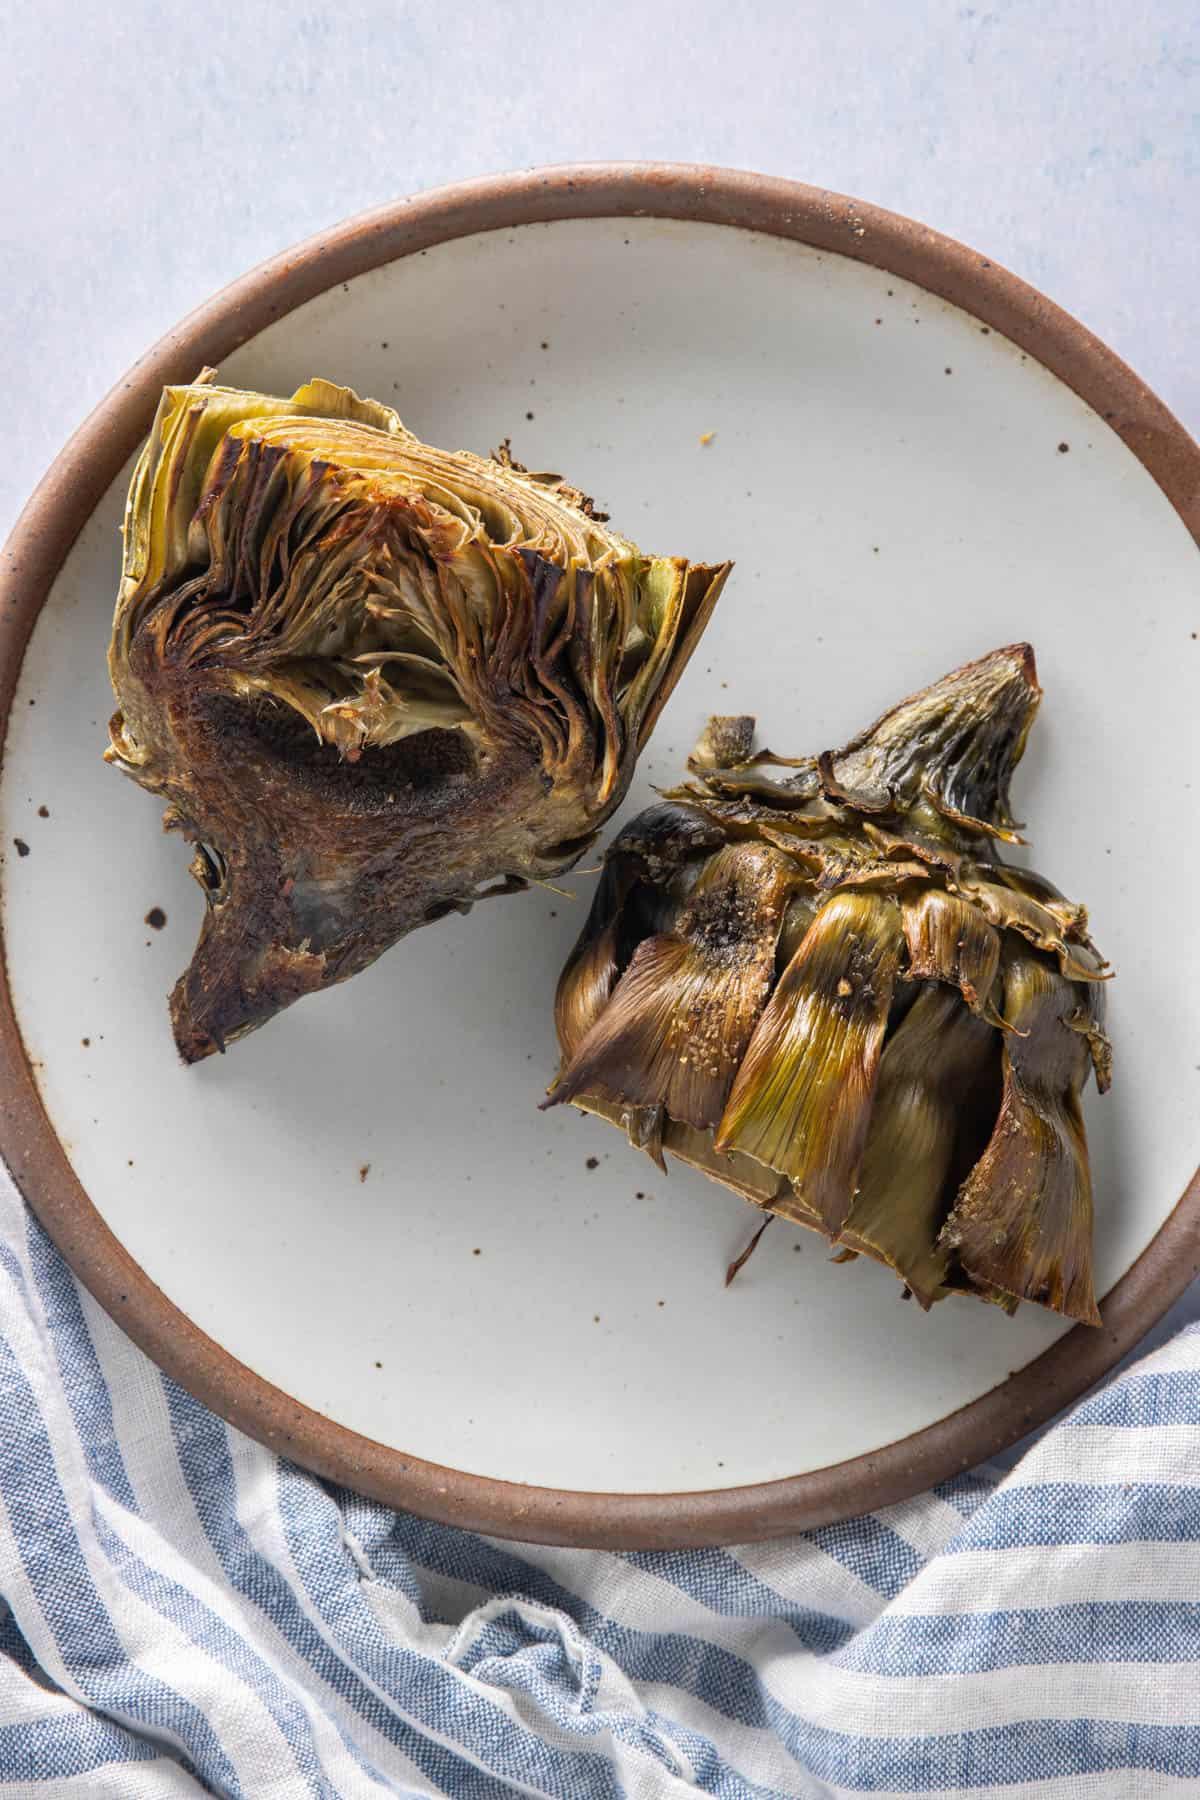 Air fried artichokes on a plate